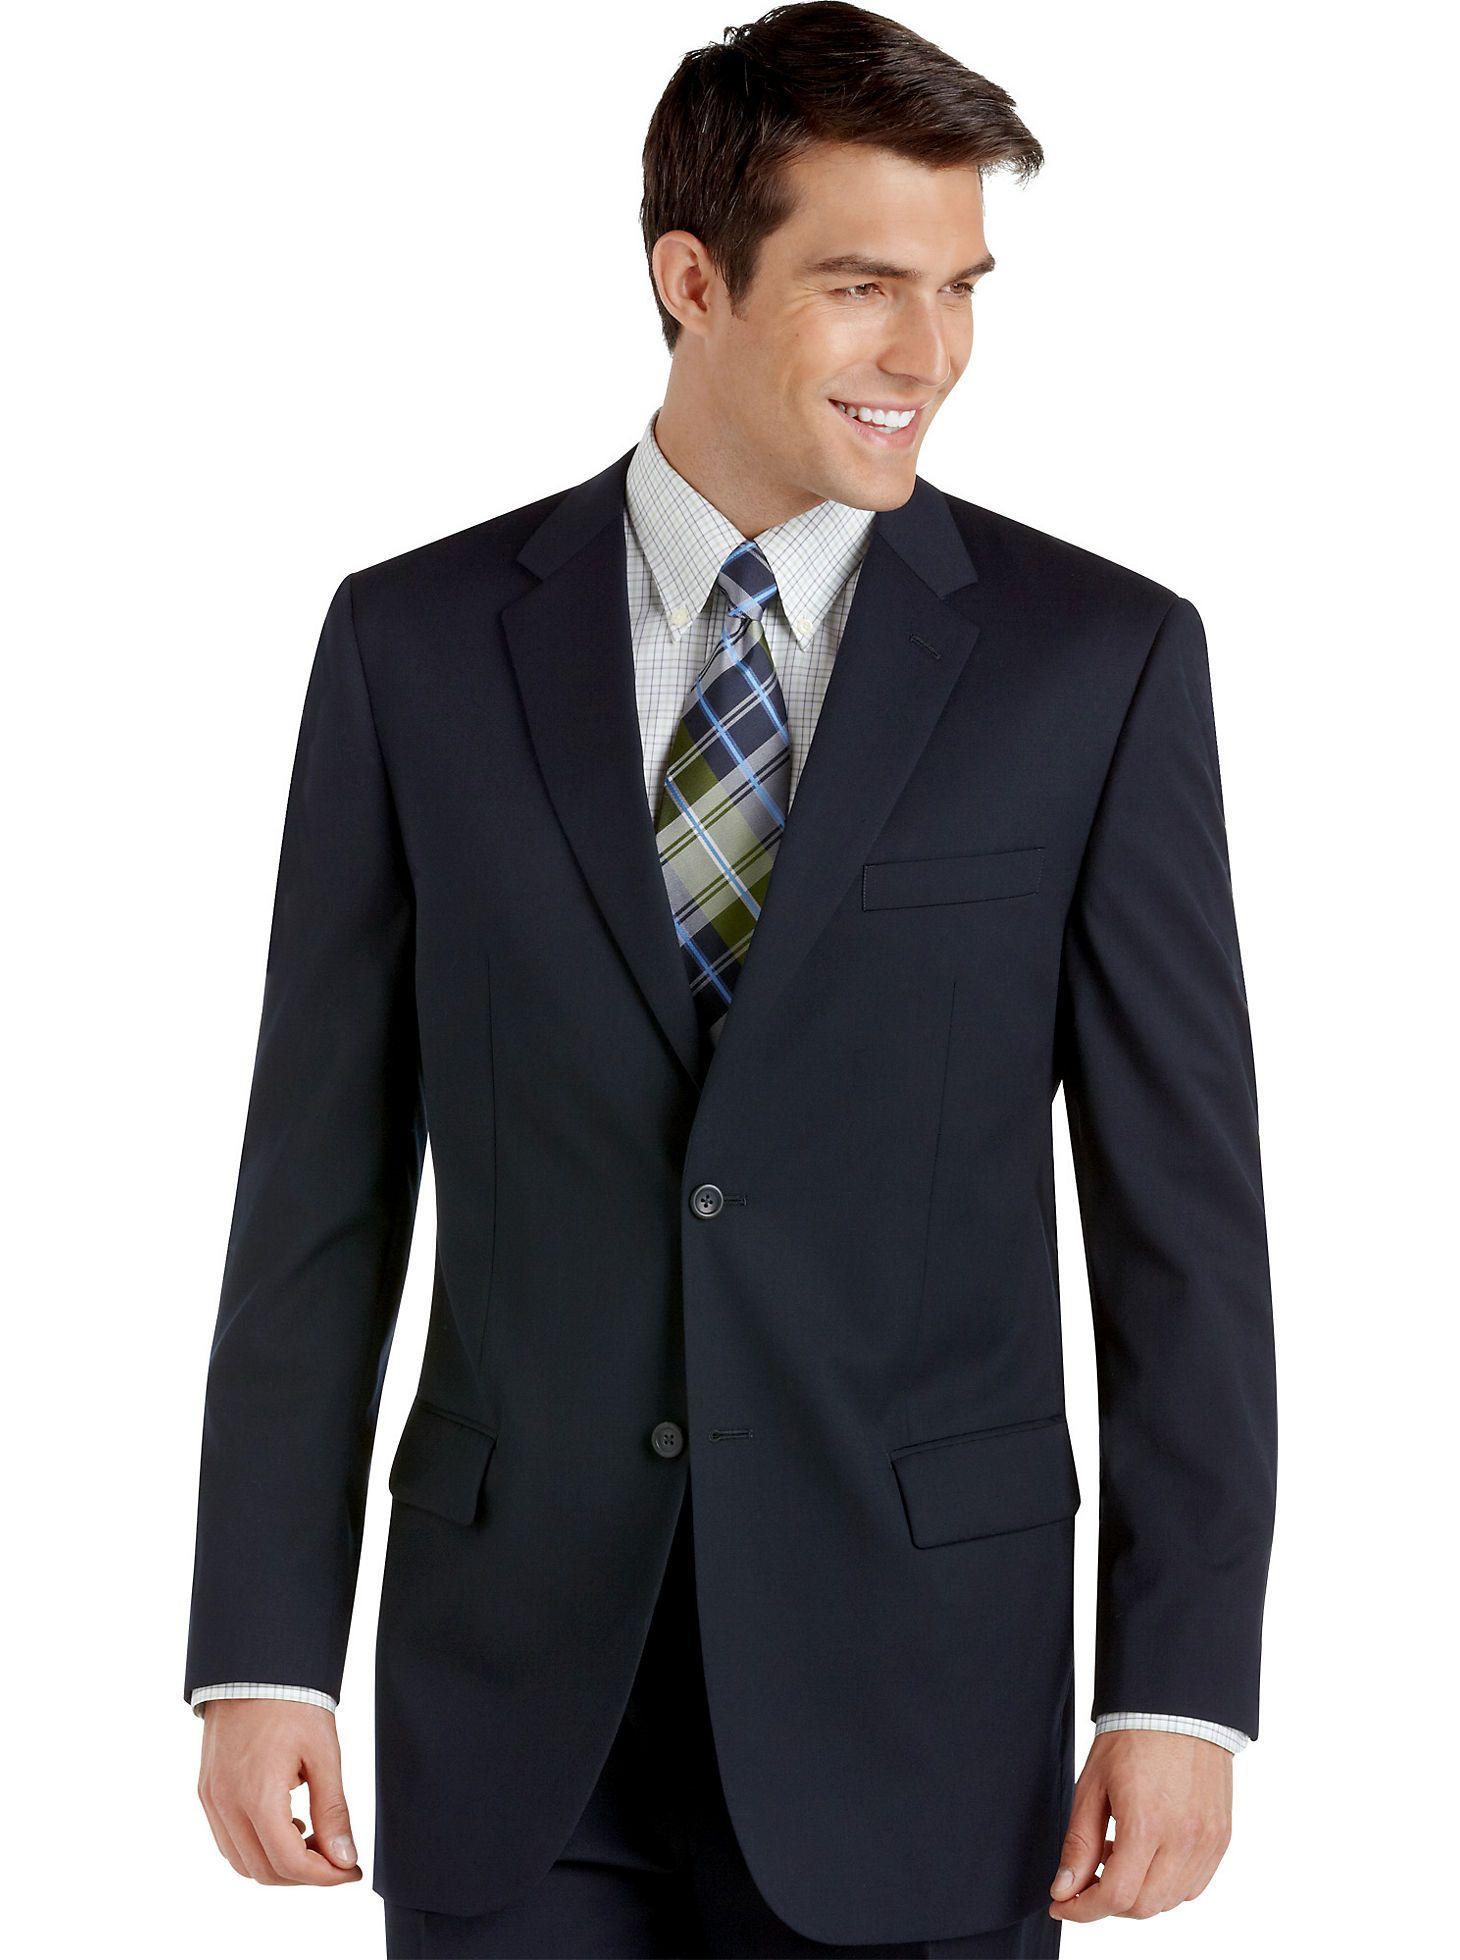 aae0ad9ee61f1 Suits - Joseph   Feiss Navy Suit - Men s Wearhouse